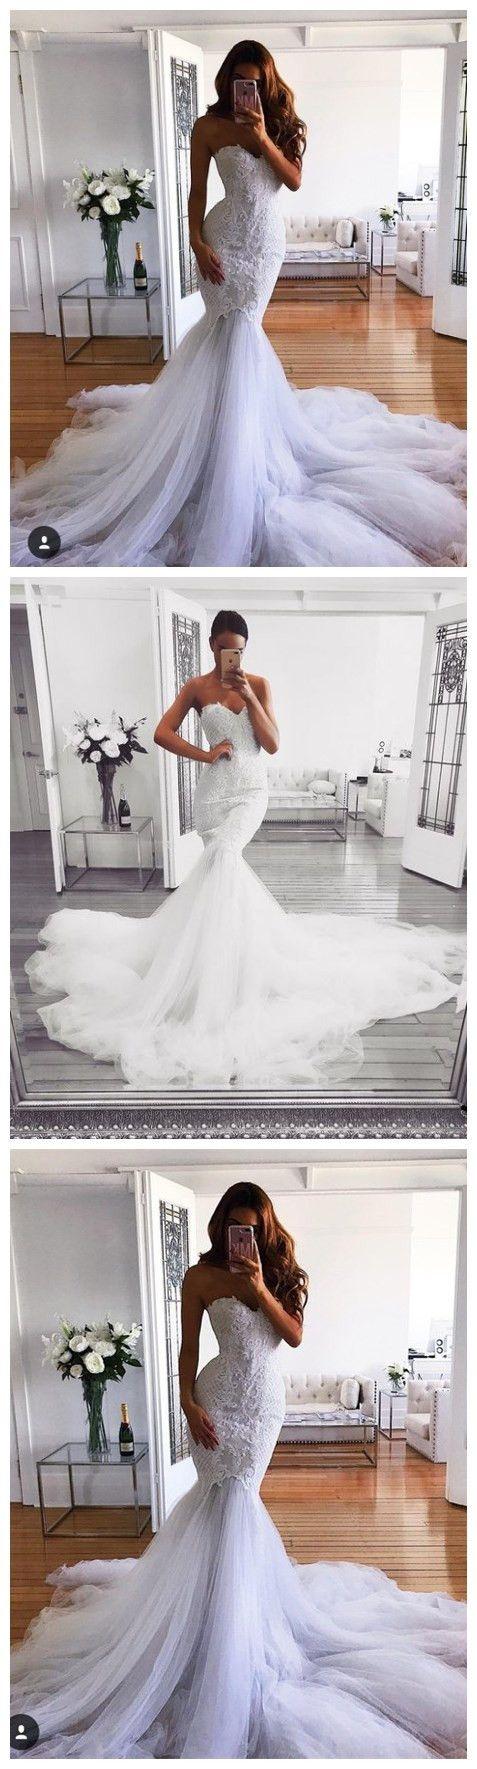 #fashion #style #shopping #love #appliques #tulleskirt #sweetheart  #weddingdresses #bridal #bridalhair #bridalgown #bridalmakeup #pure #autumn #Sheath #Mermaid #sheathdress  Sweetheart Neck Sheath Mermaid Wedding Dresses, Appliques Sweep Train White Dresses ASD26731